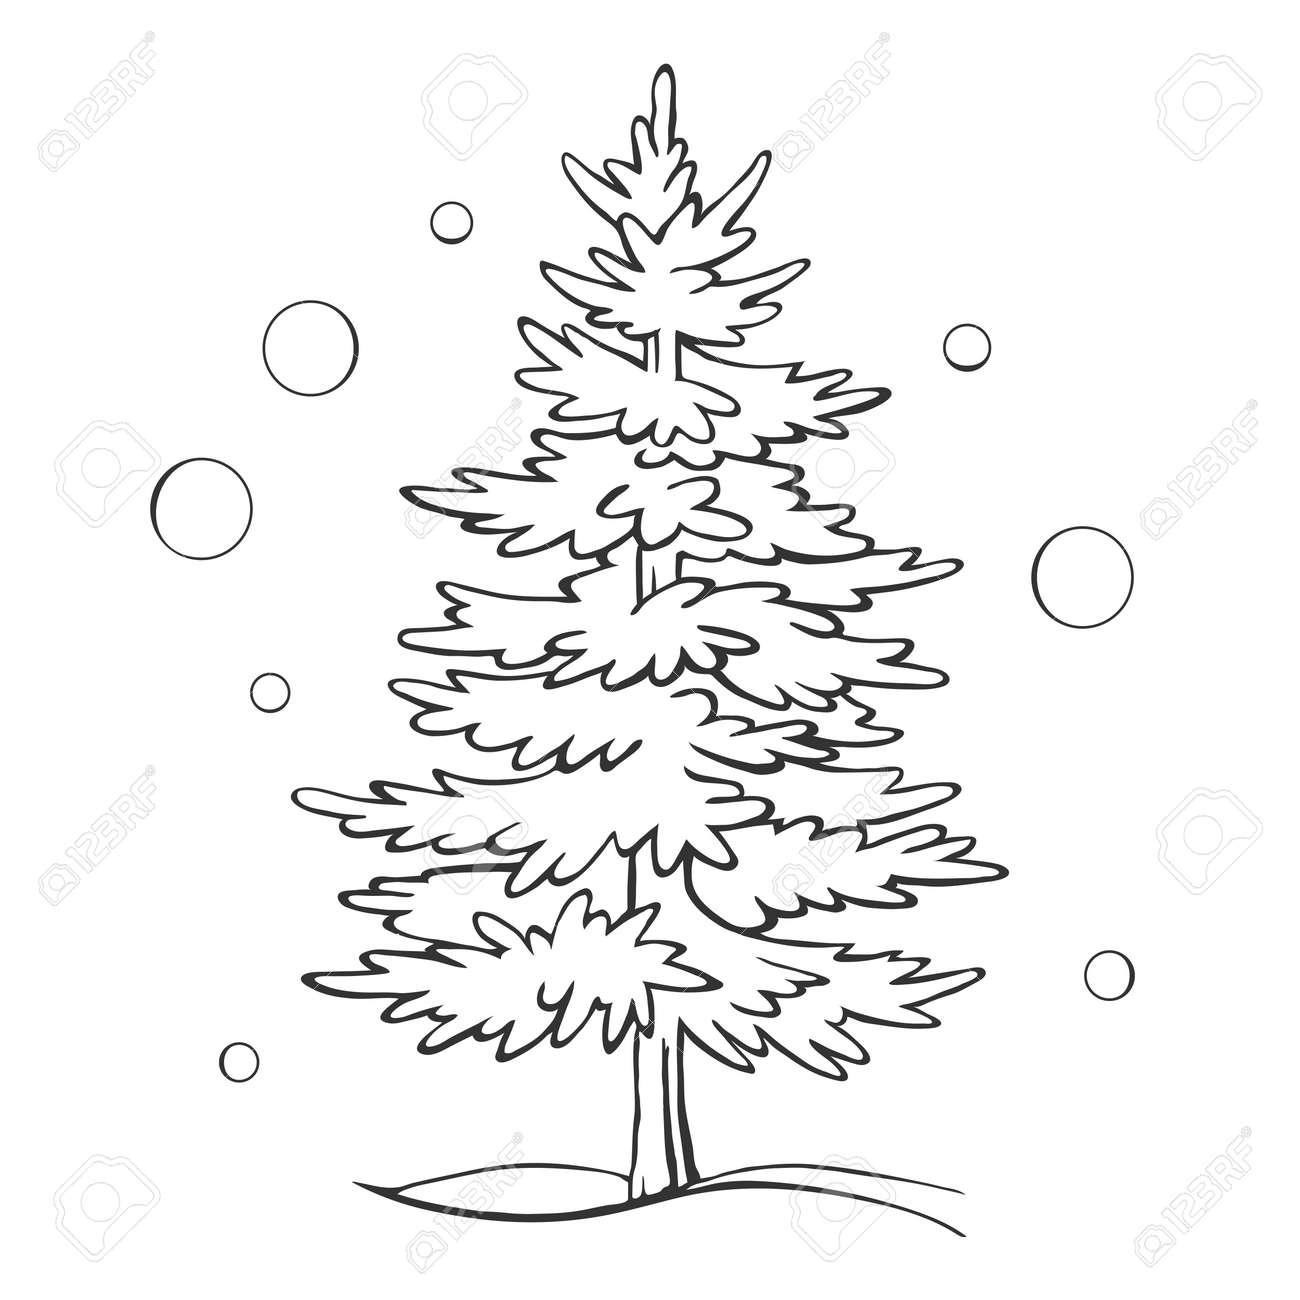 Drawing Christmas Tree Sketch.Christmas Tree Sketch Symbol Vector Xmas Winter Outline Drawing